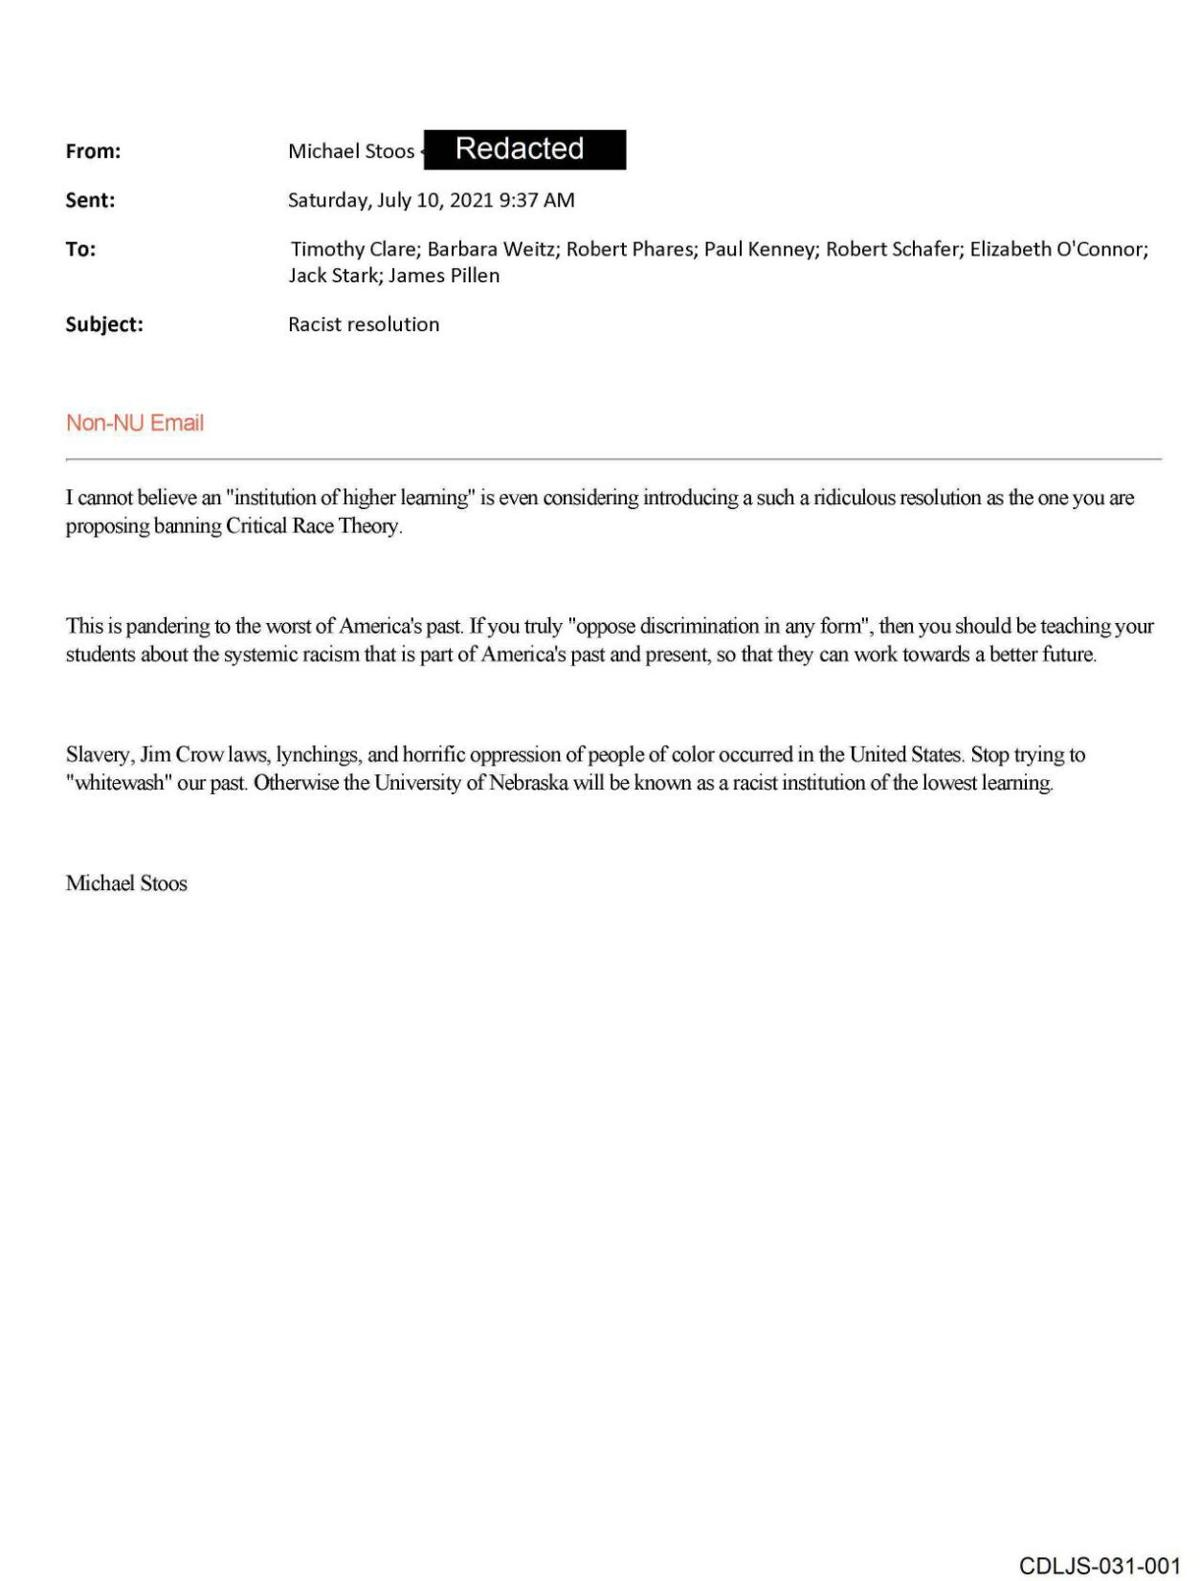 CDLJS-031-001.pdf